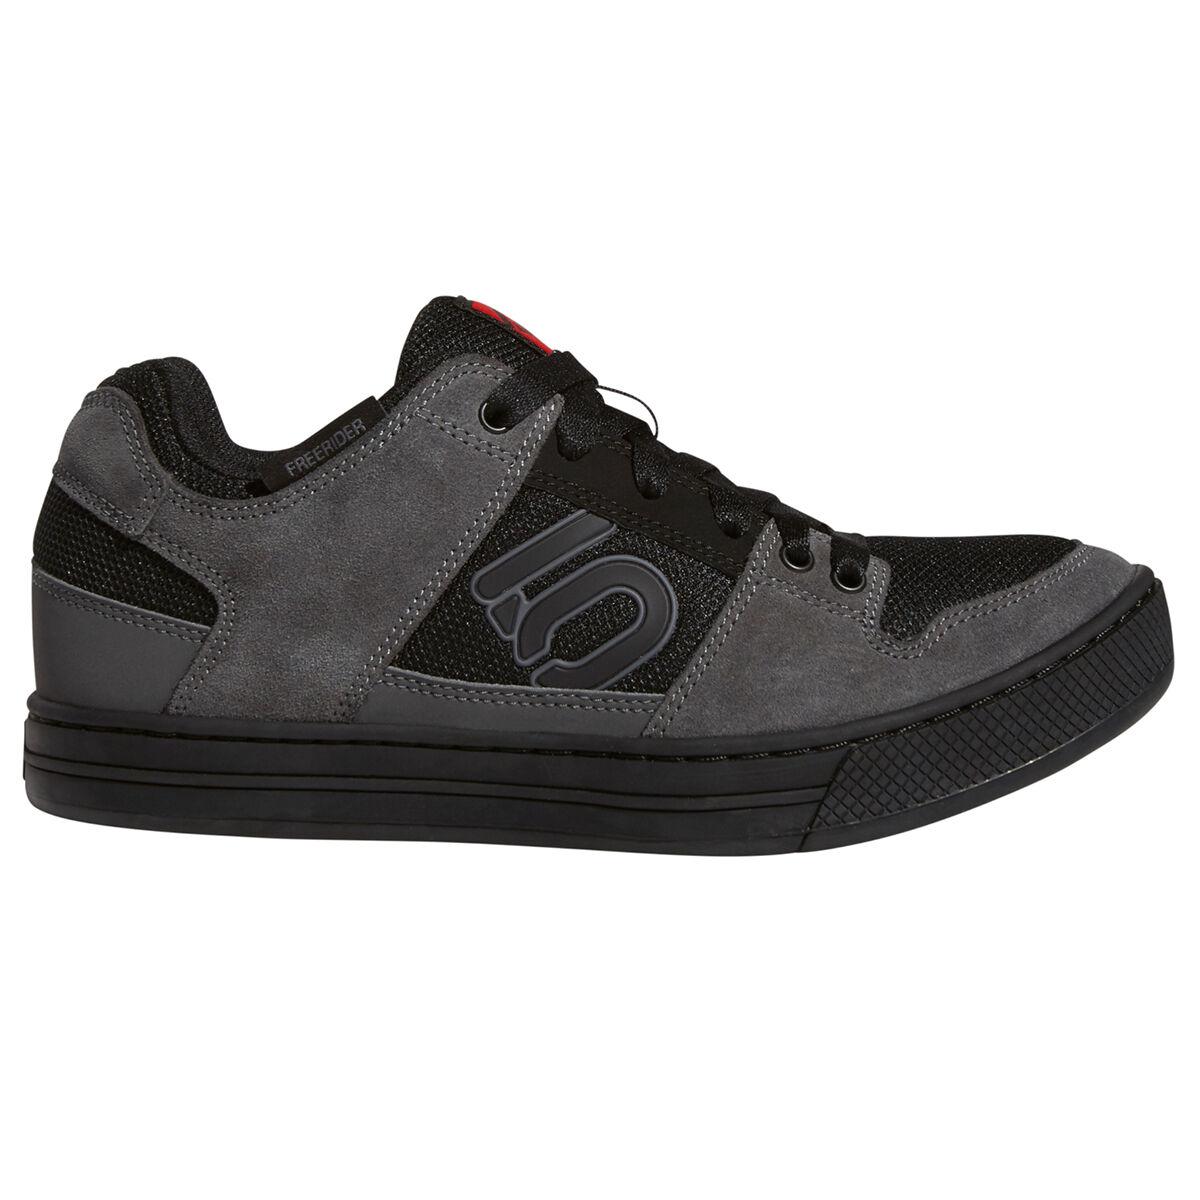 FIVE.TEN Five. ten Men's Freerider Mountain Bike Shoes - Size 11.5